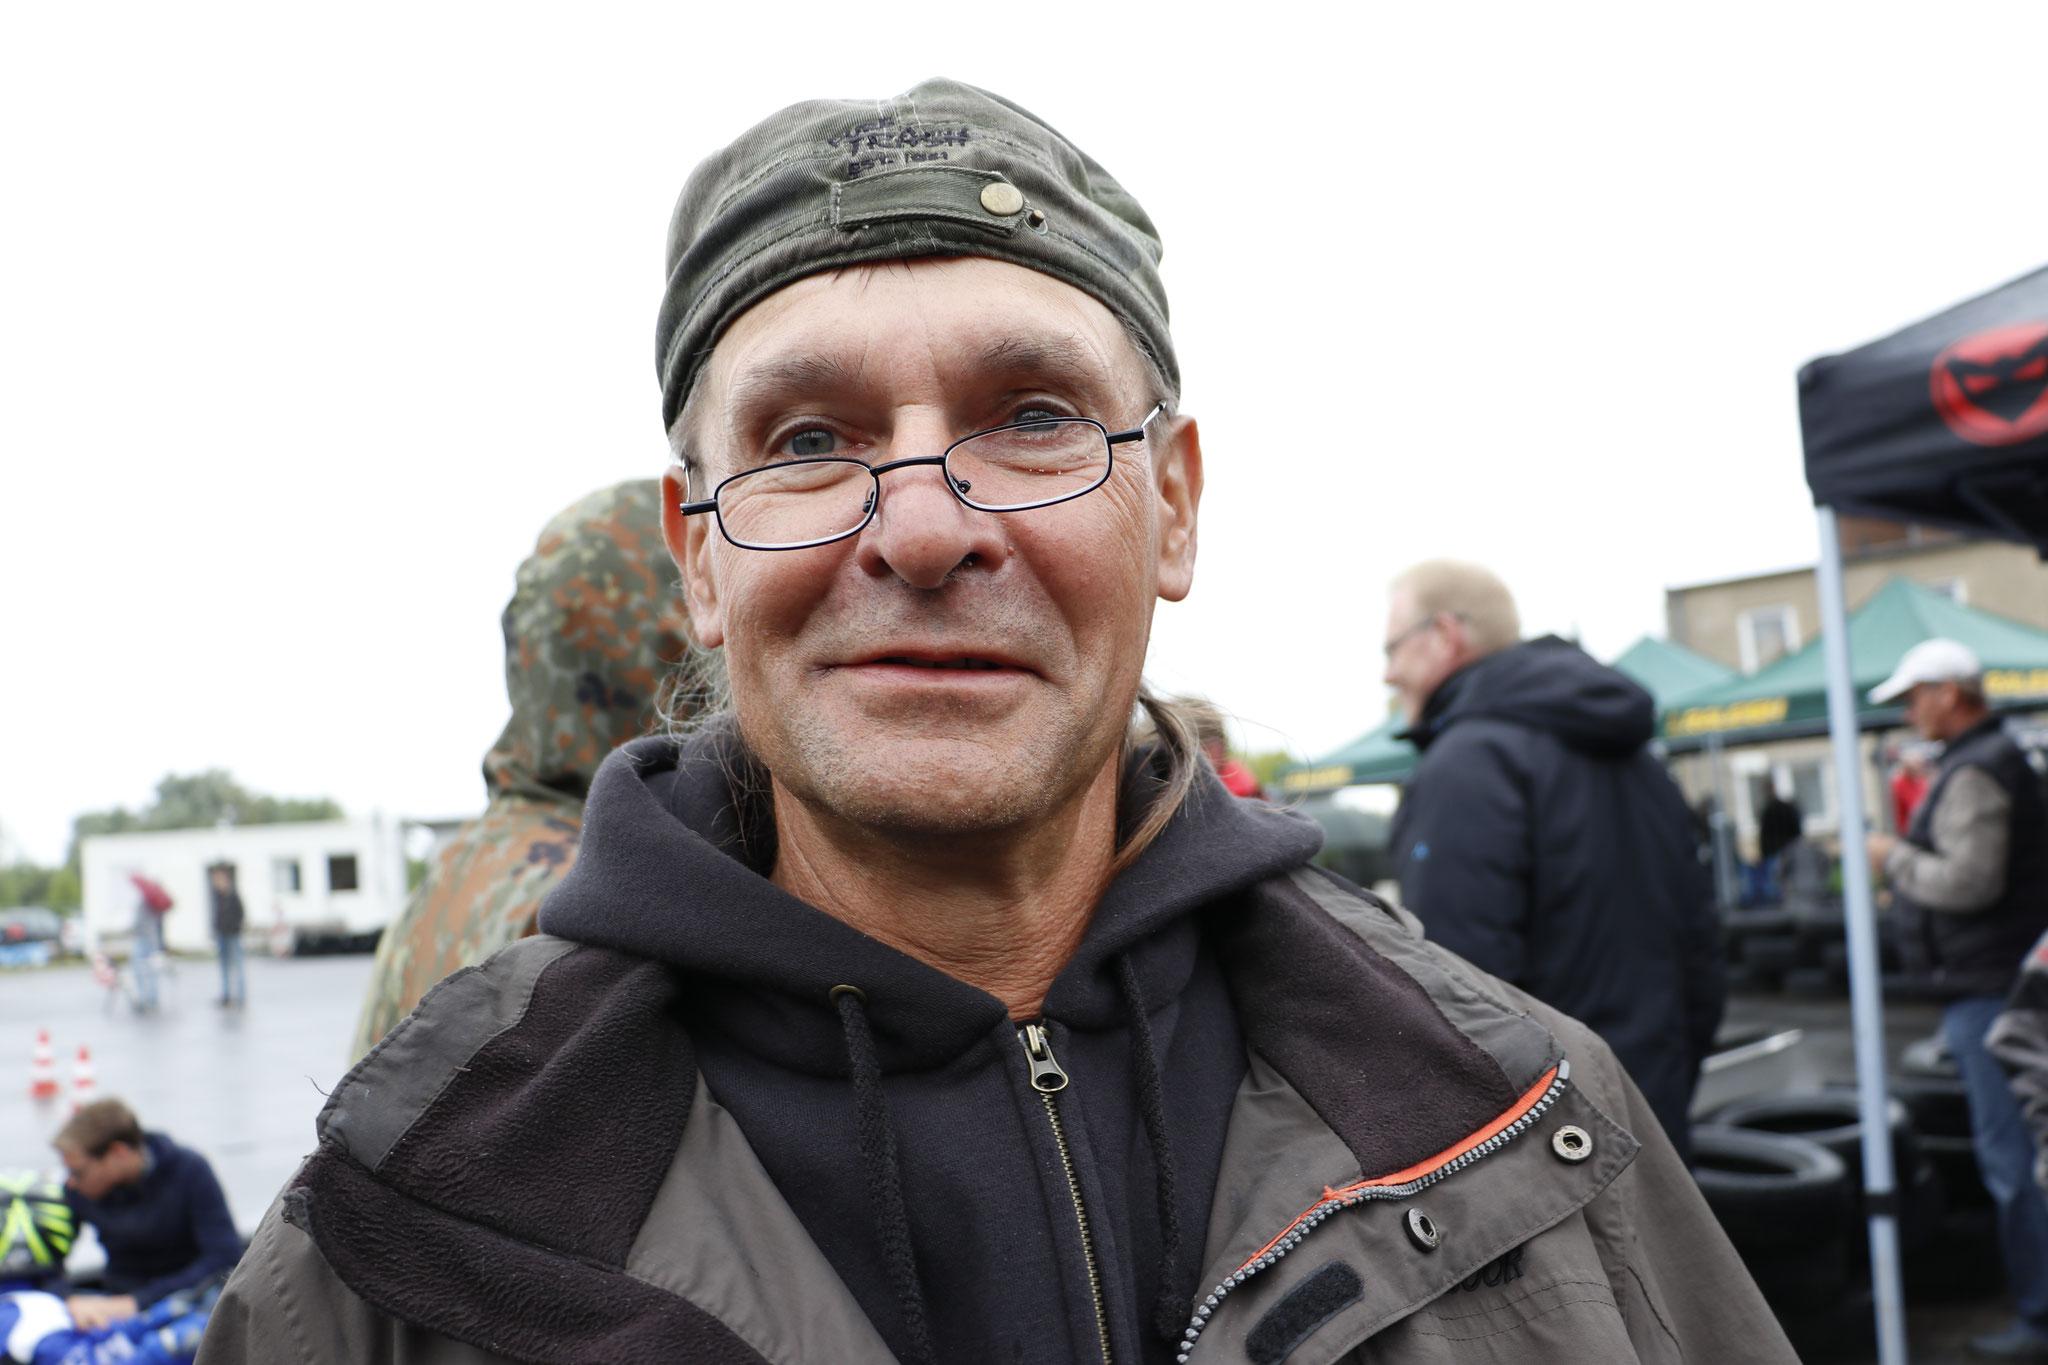 Ralf Rohde